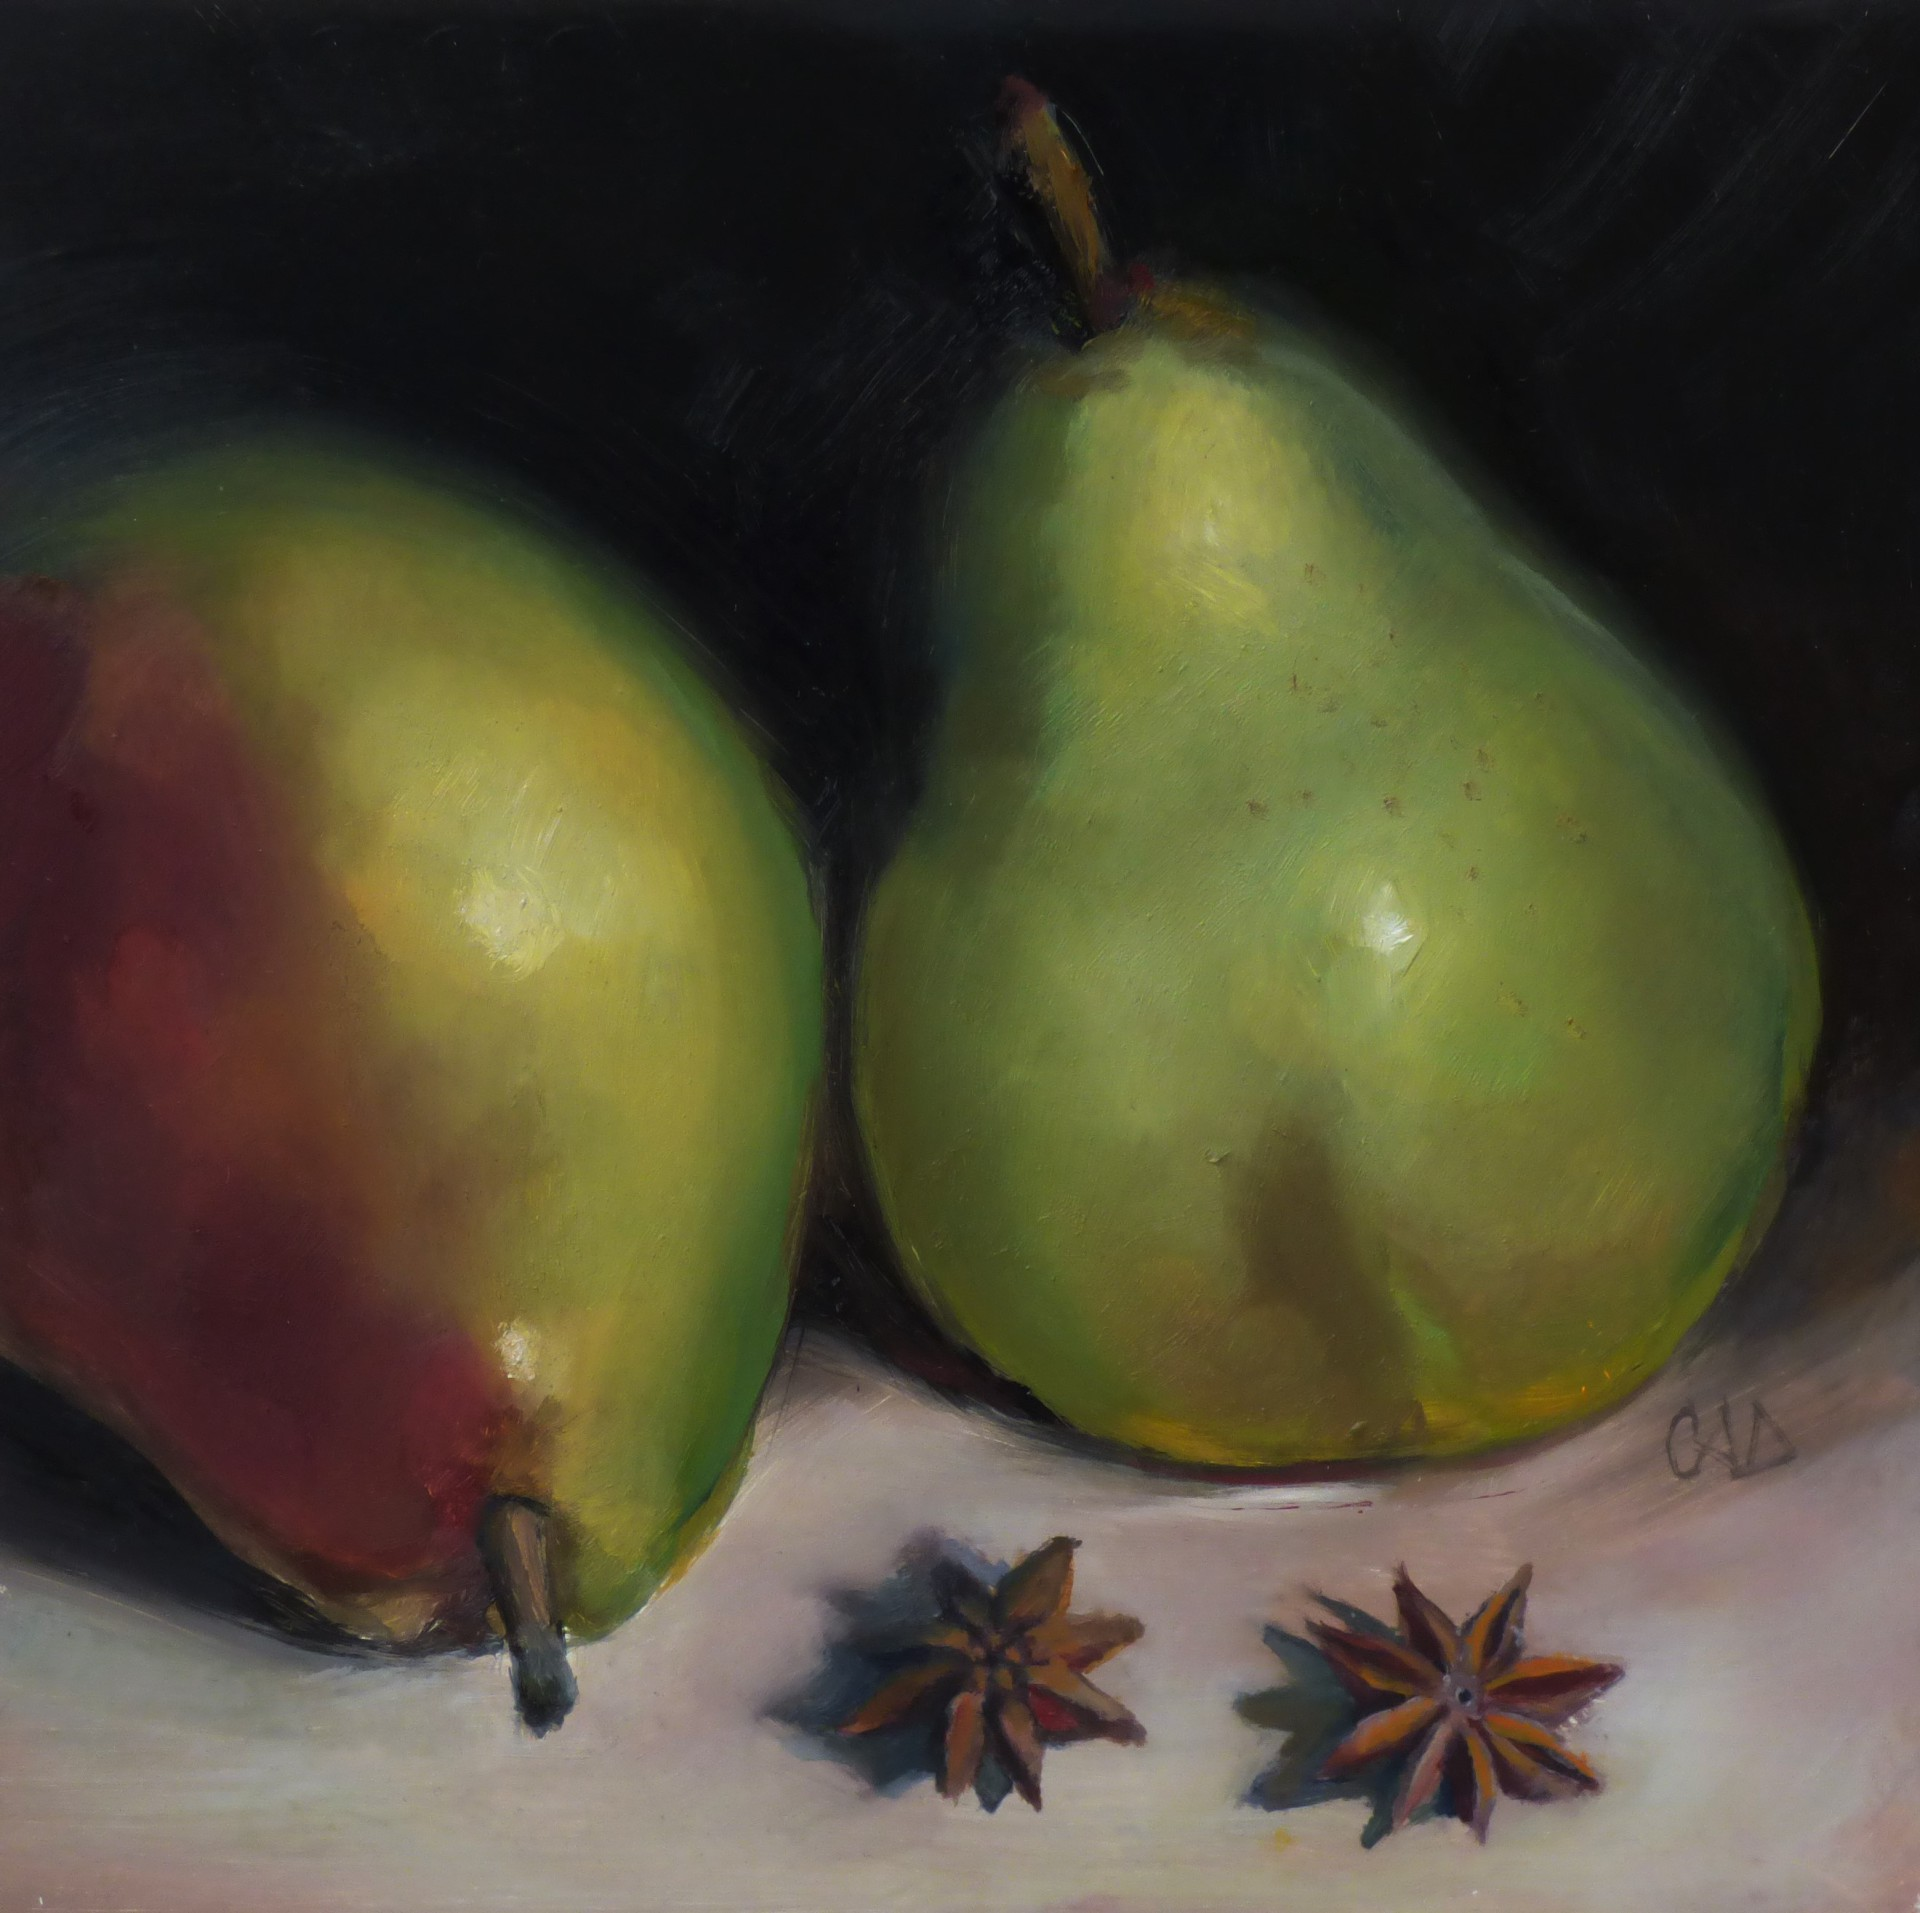 Pear'nts